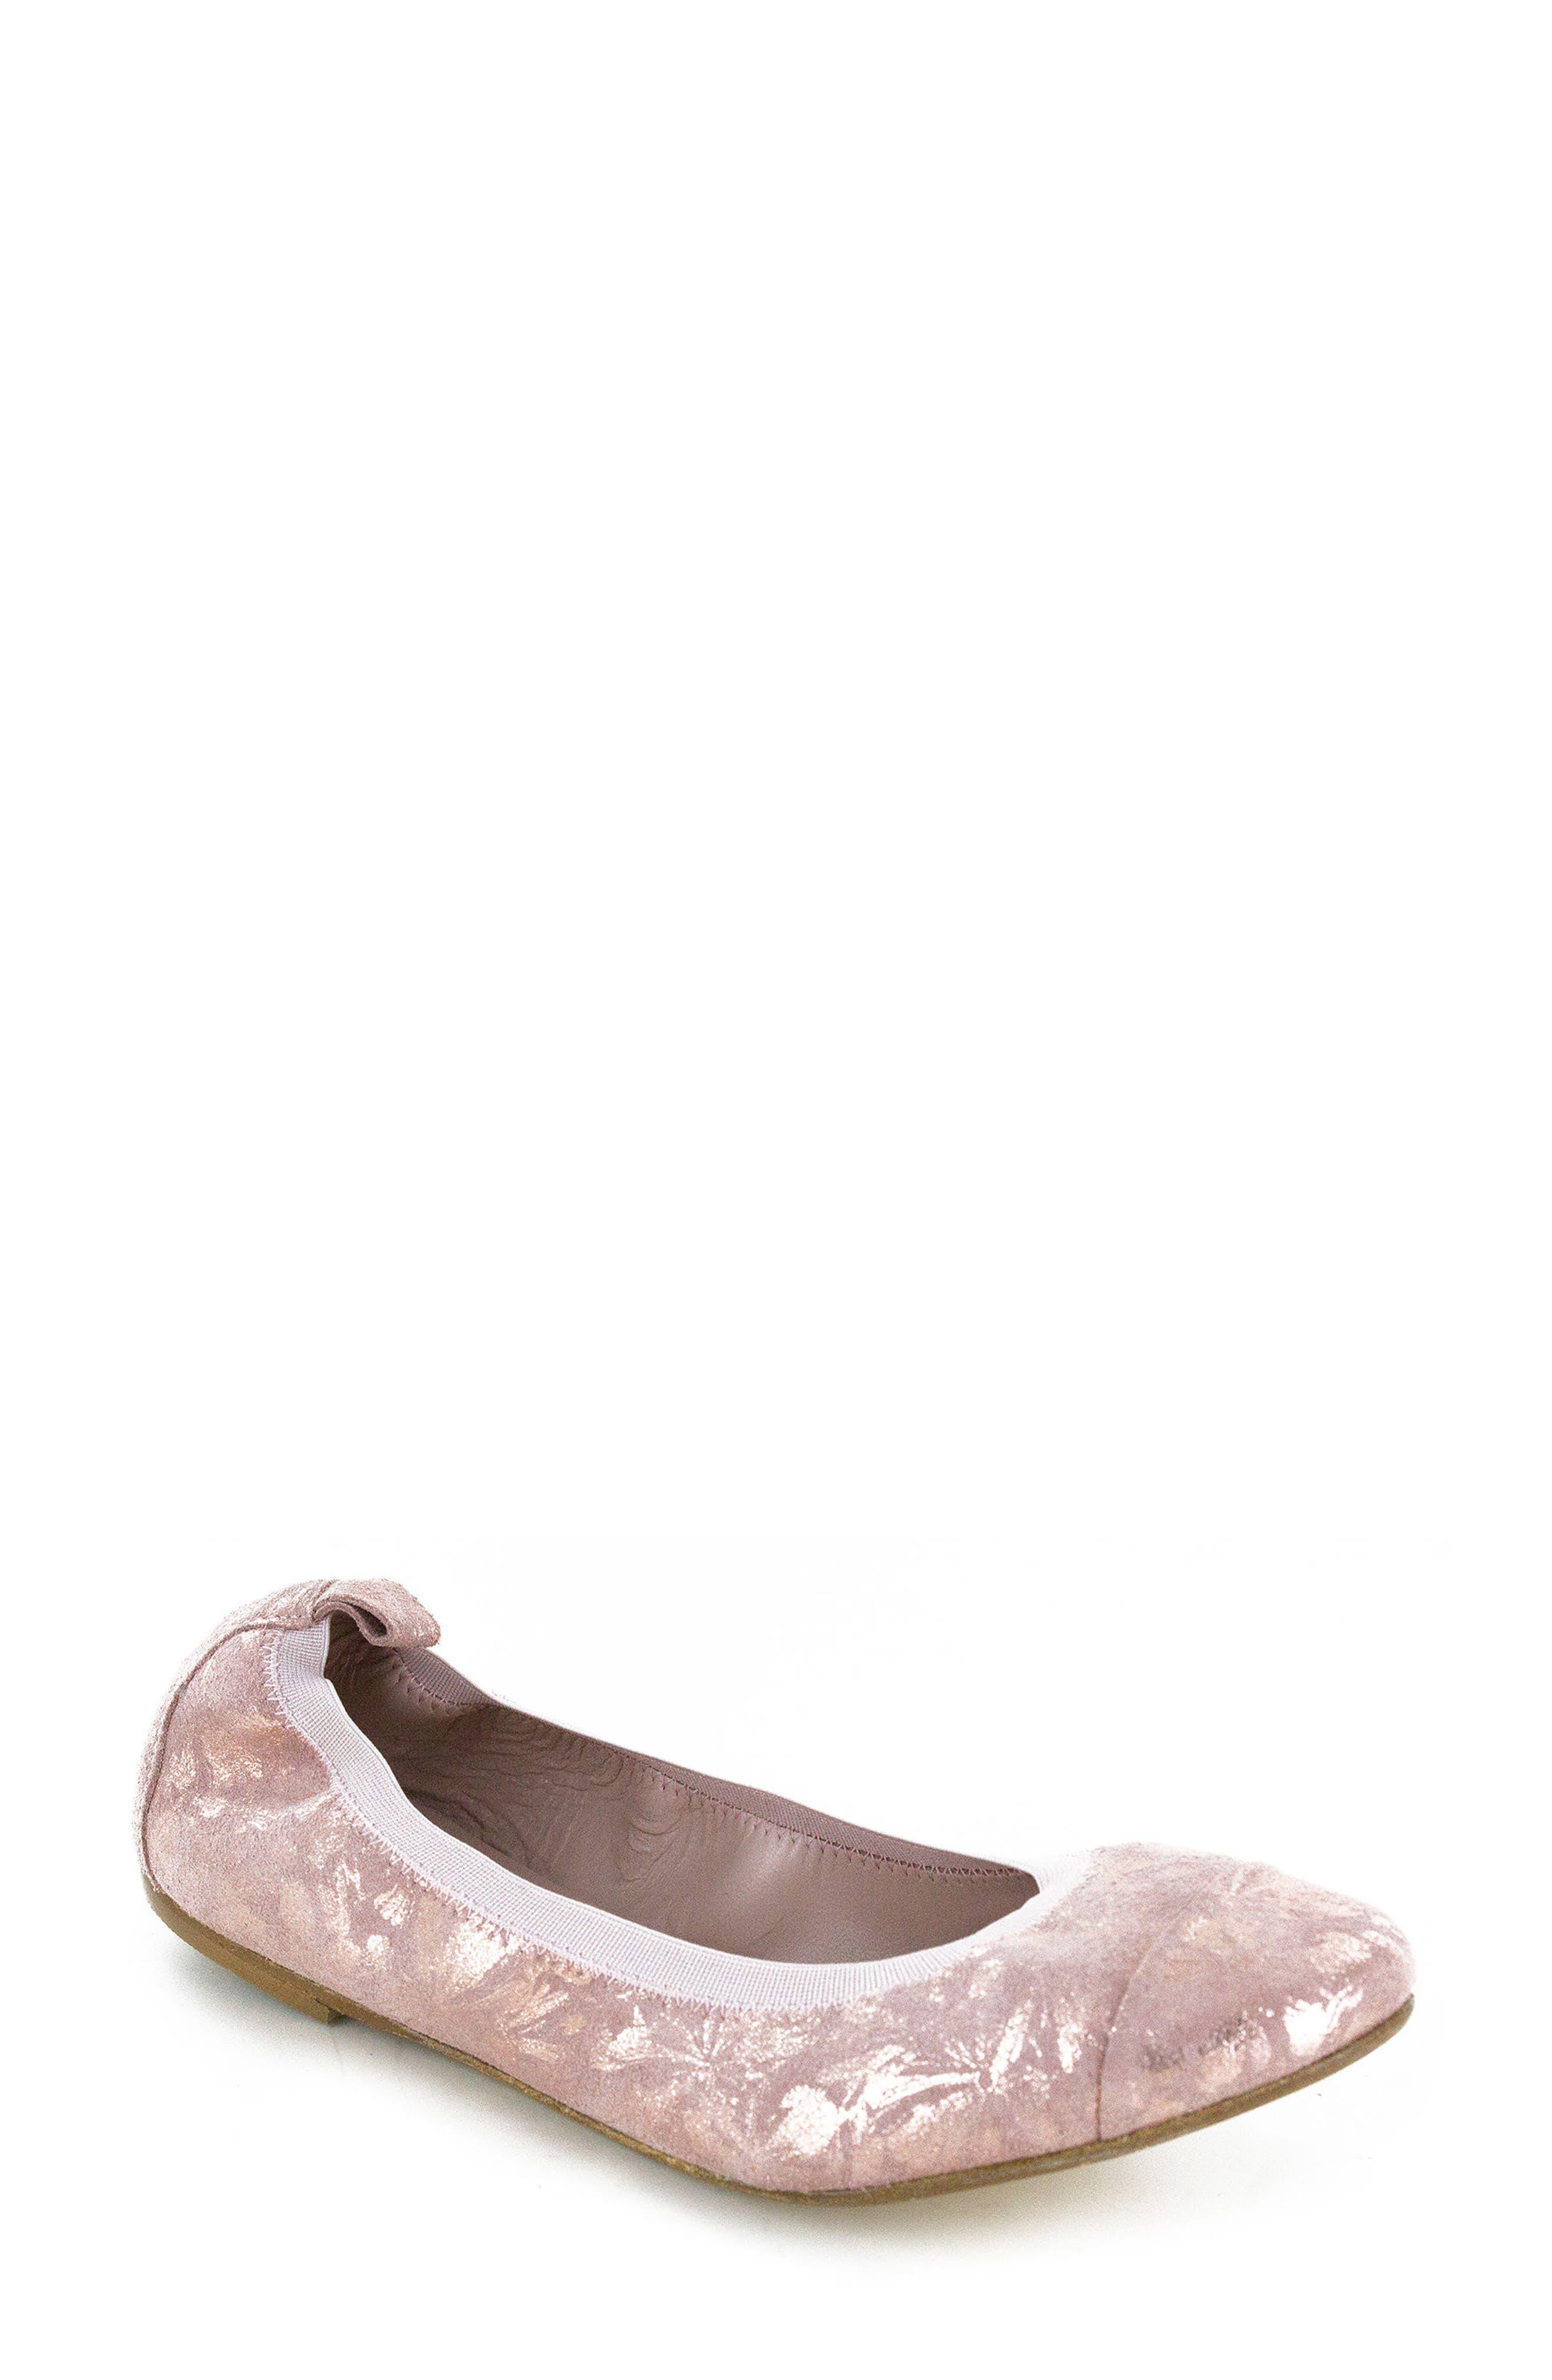 Kara Ballet Flat,                         Main,                         color, Rose Quartz Floral Leather